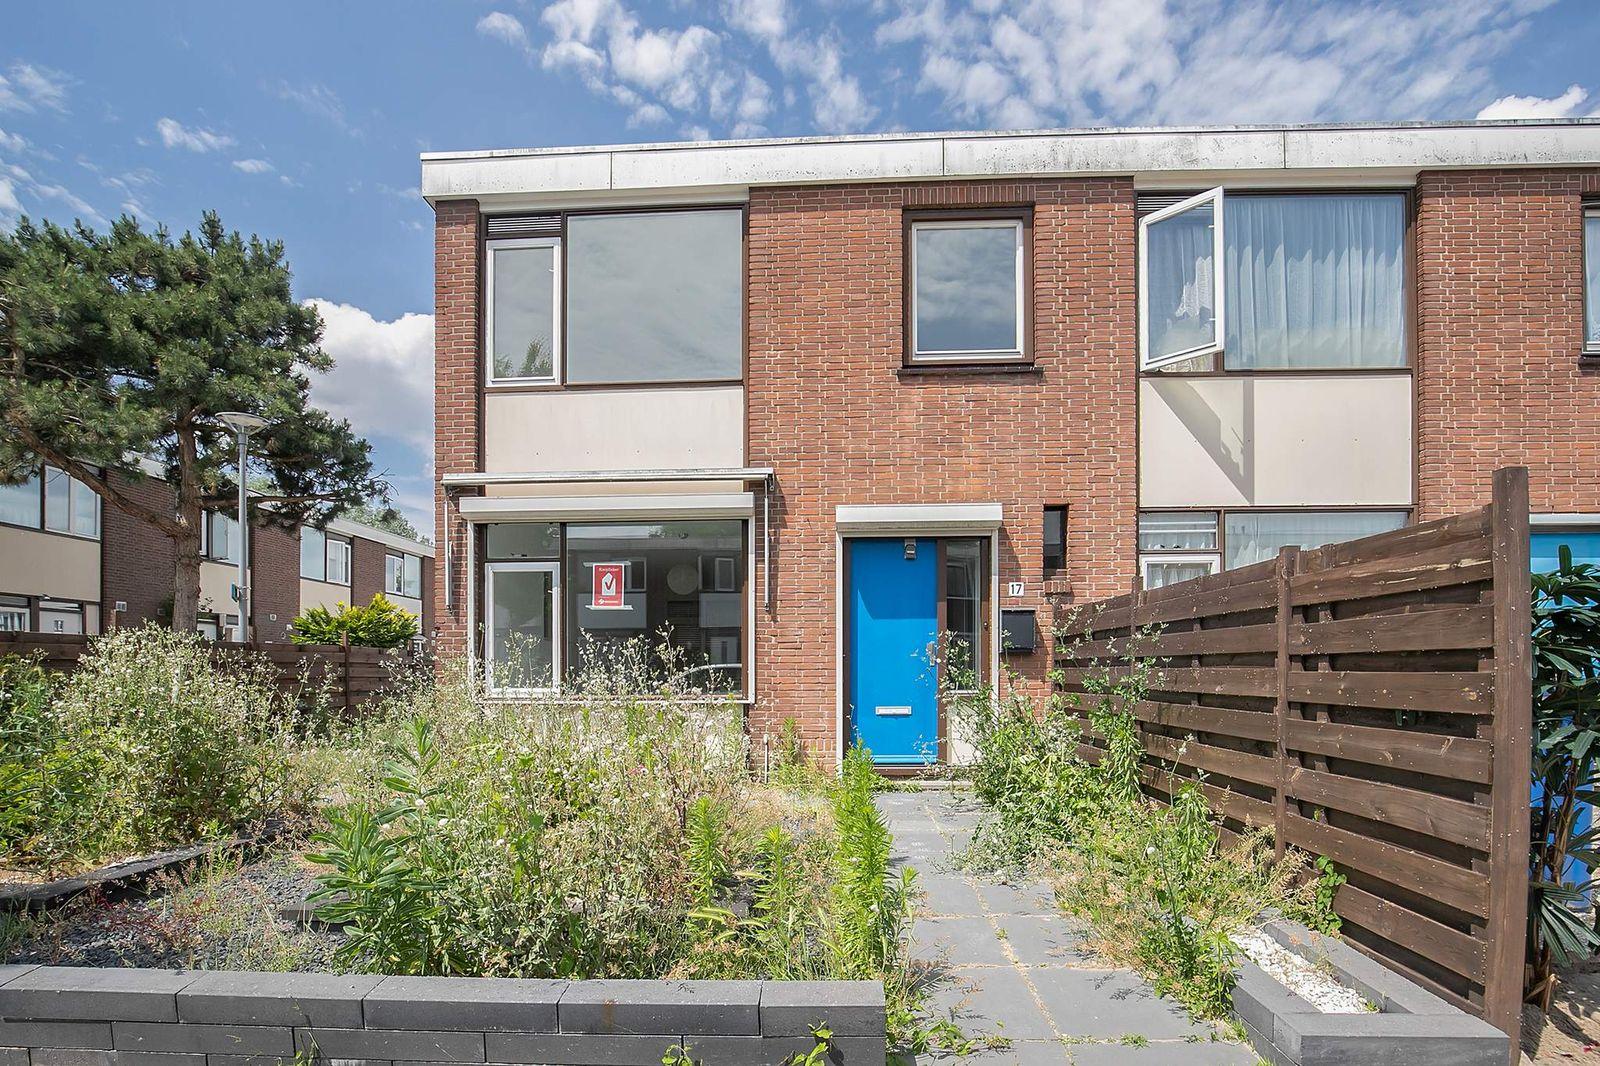 Racinestraat 17, Rotterdam